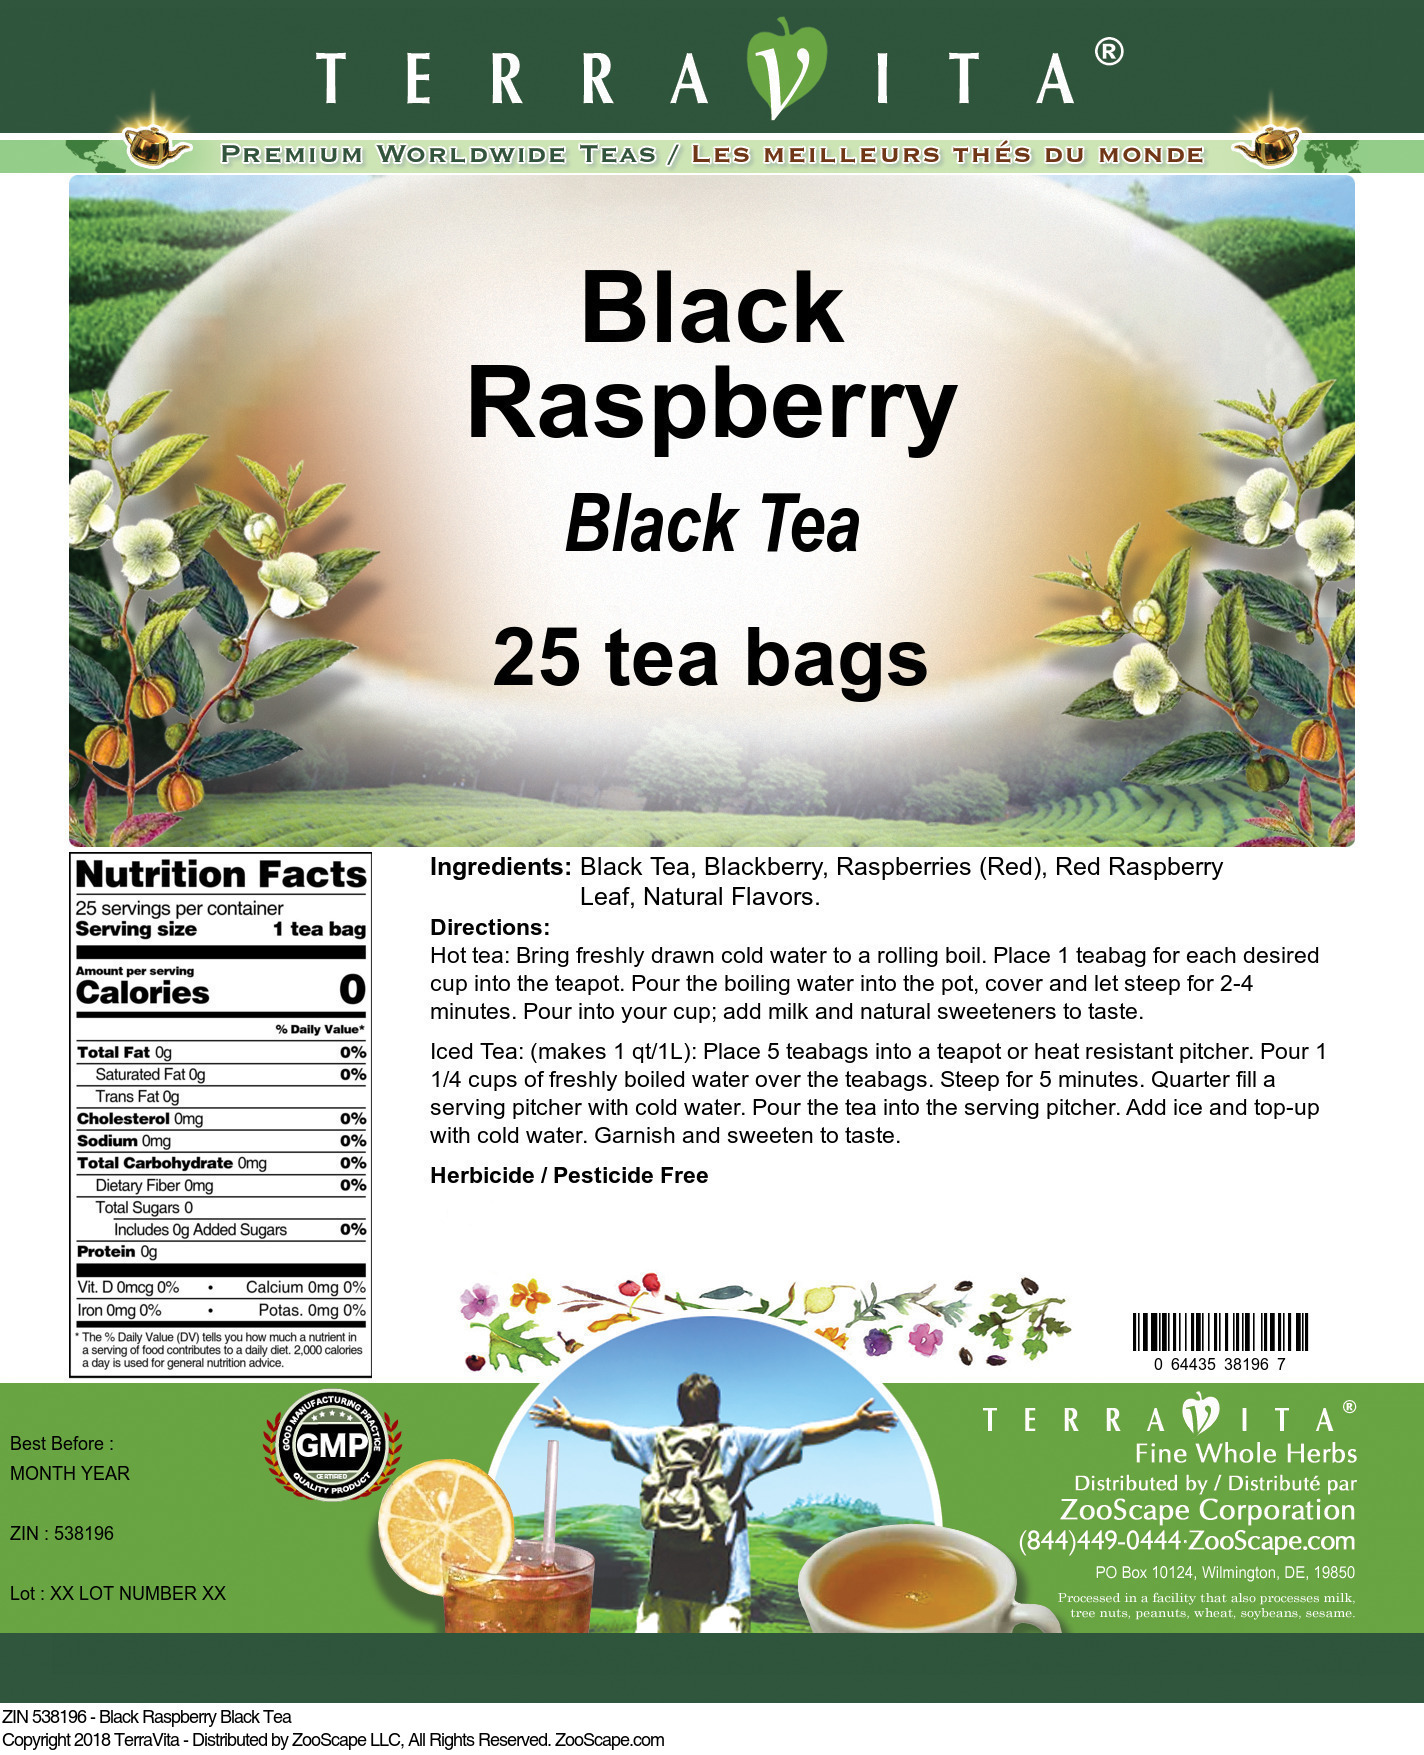 Black Raspberry Black Tea